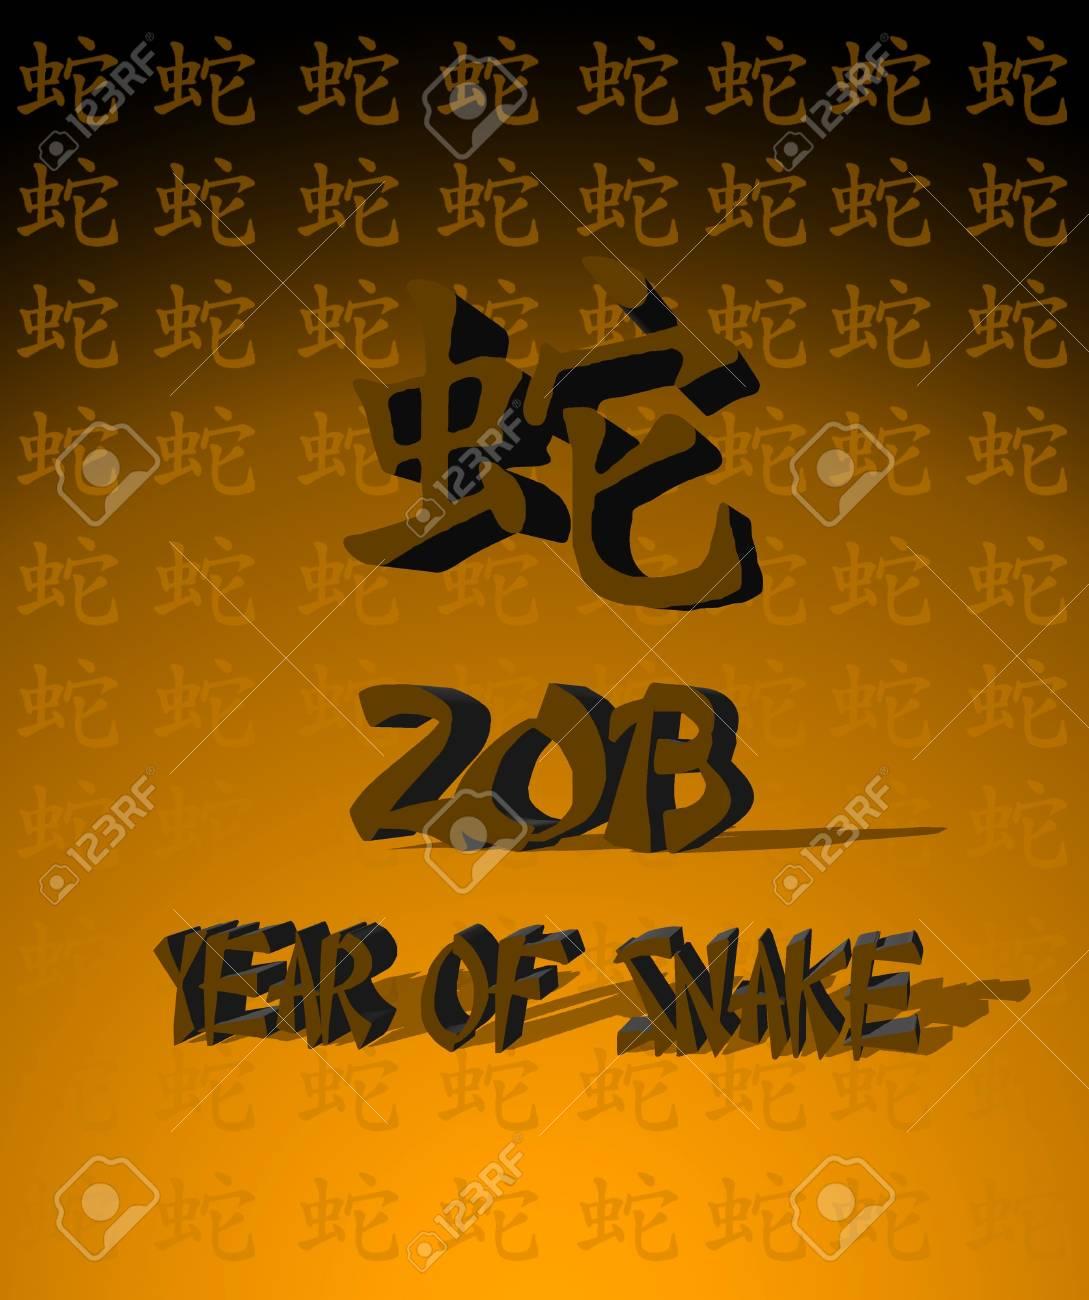 Illustration of Year of the snake 2013 Stock Illustration - 15611687